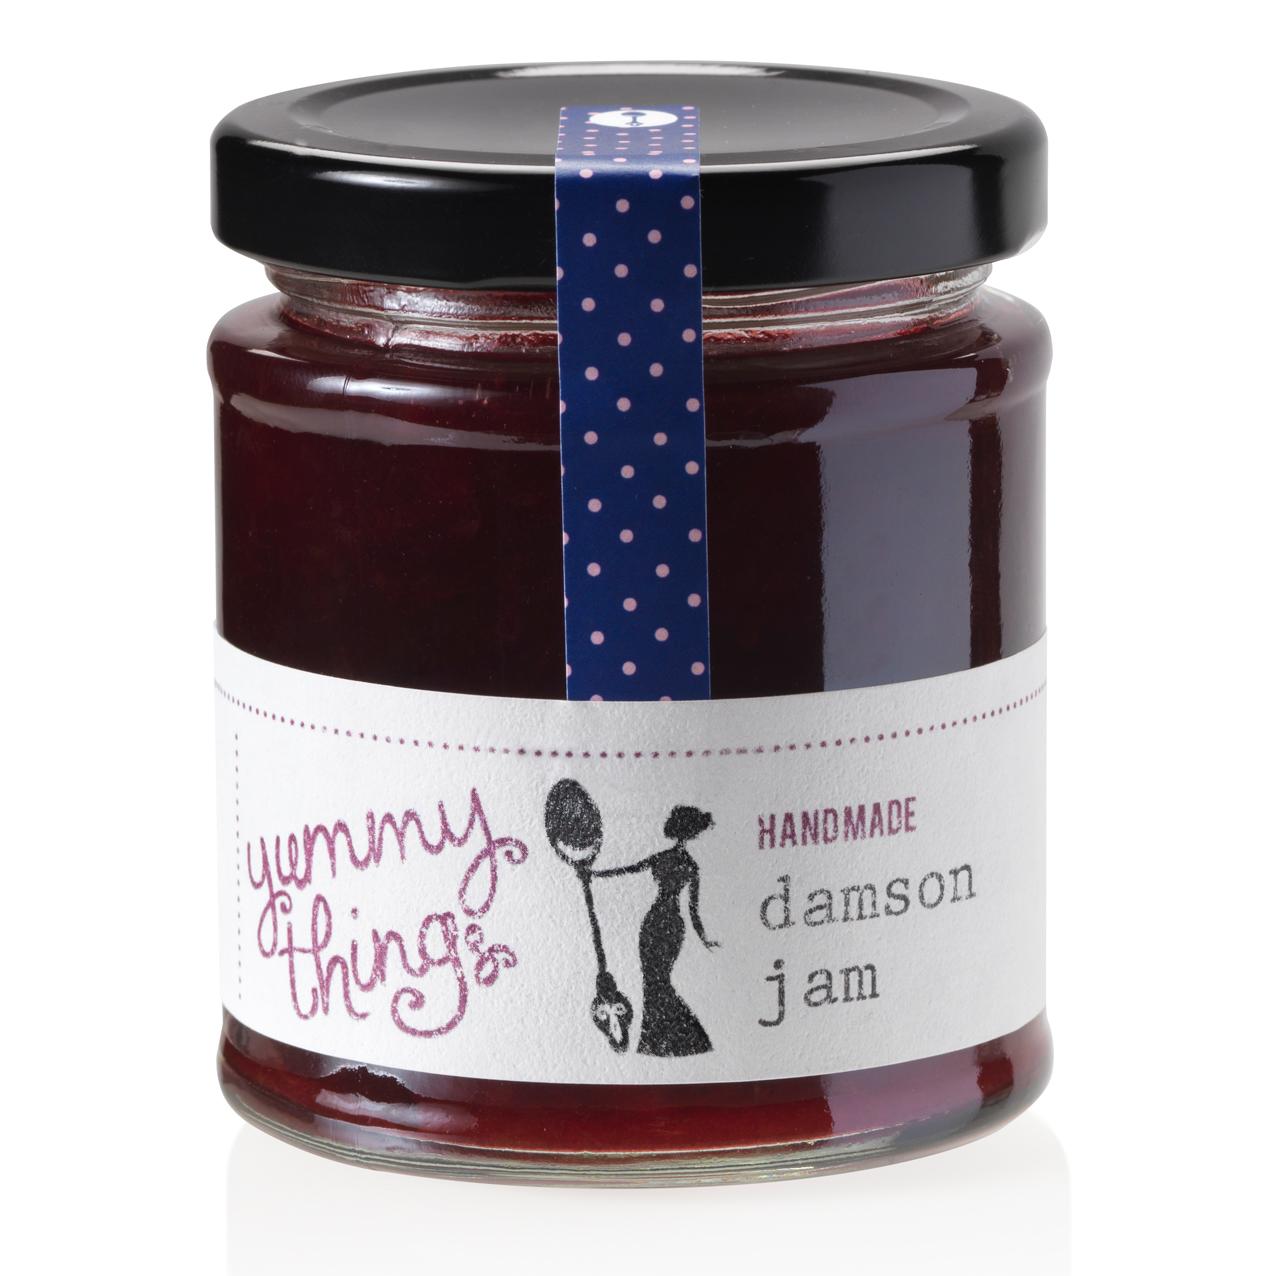 Yummy Things' delicious, seasonal handmade damson jam - Handmade in Gosforth, Newcastle upon Tyne - The perfect foodie gift!